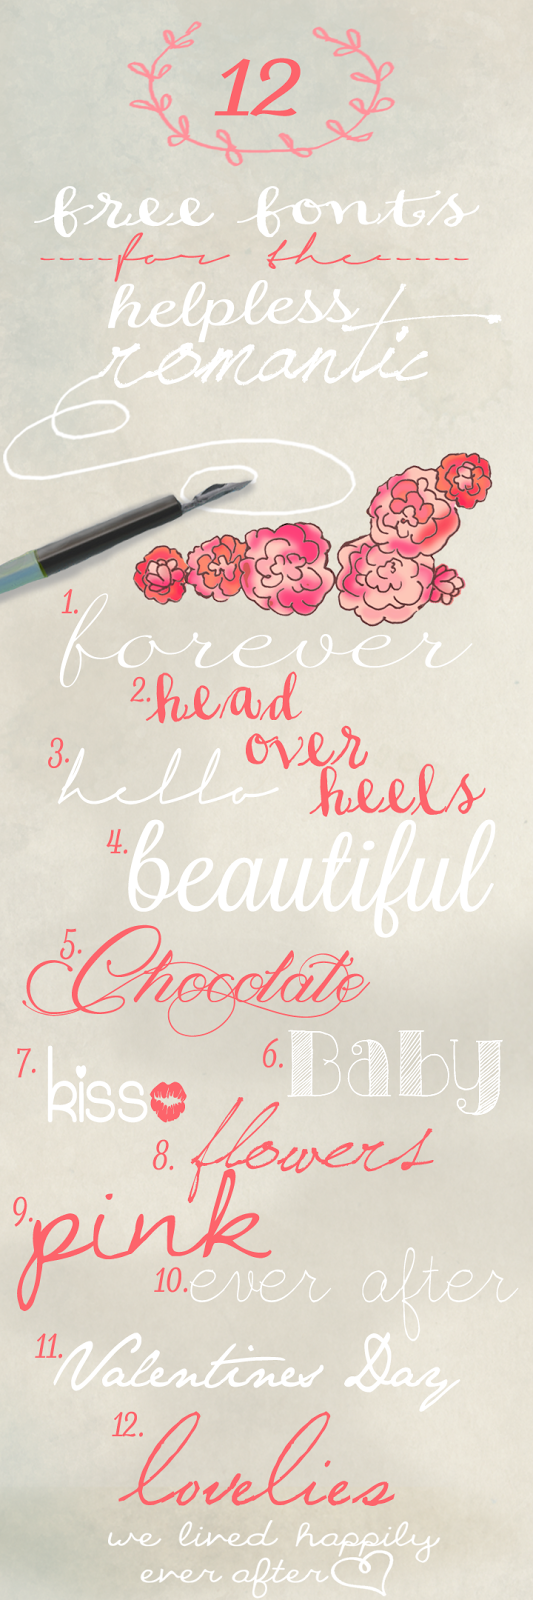 http://1.bp.blogspot.com/-Wg5VFKodEZU/UuW1yfIr9sI/AAAAAAAARJE/YbOFTWhcloE/s1600/Free+Valentine's+Day+Fonts++Fonts+for+the+Helpless+Romantic.png